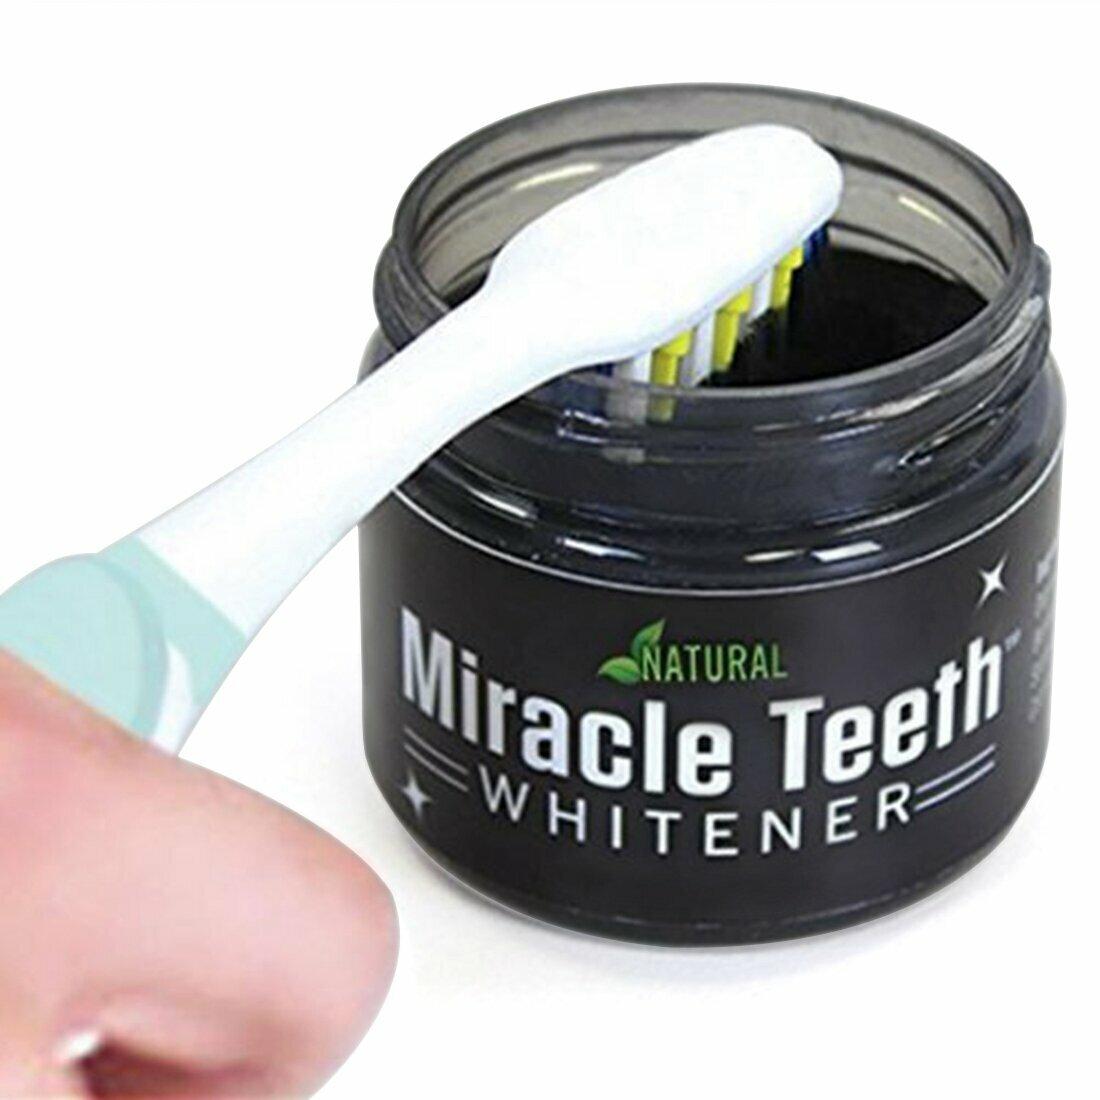 Отбеливатель зубов Miracle Teeth Whitener в Пензе